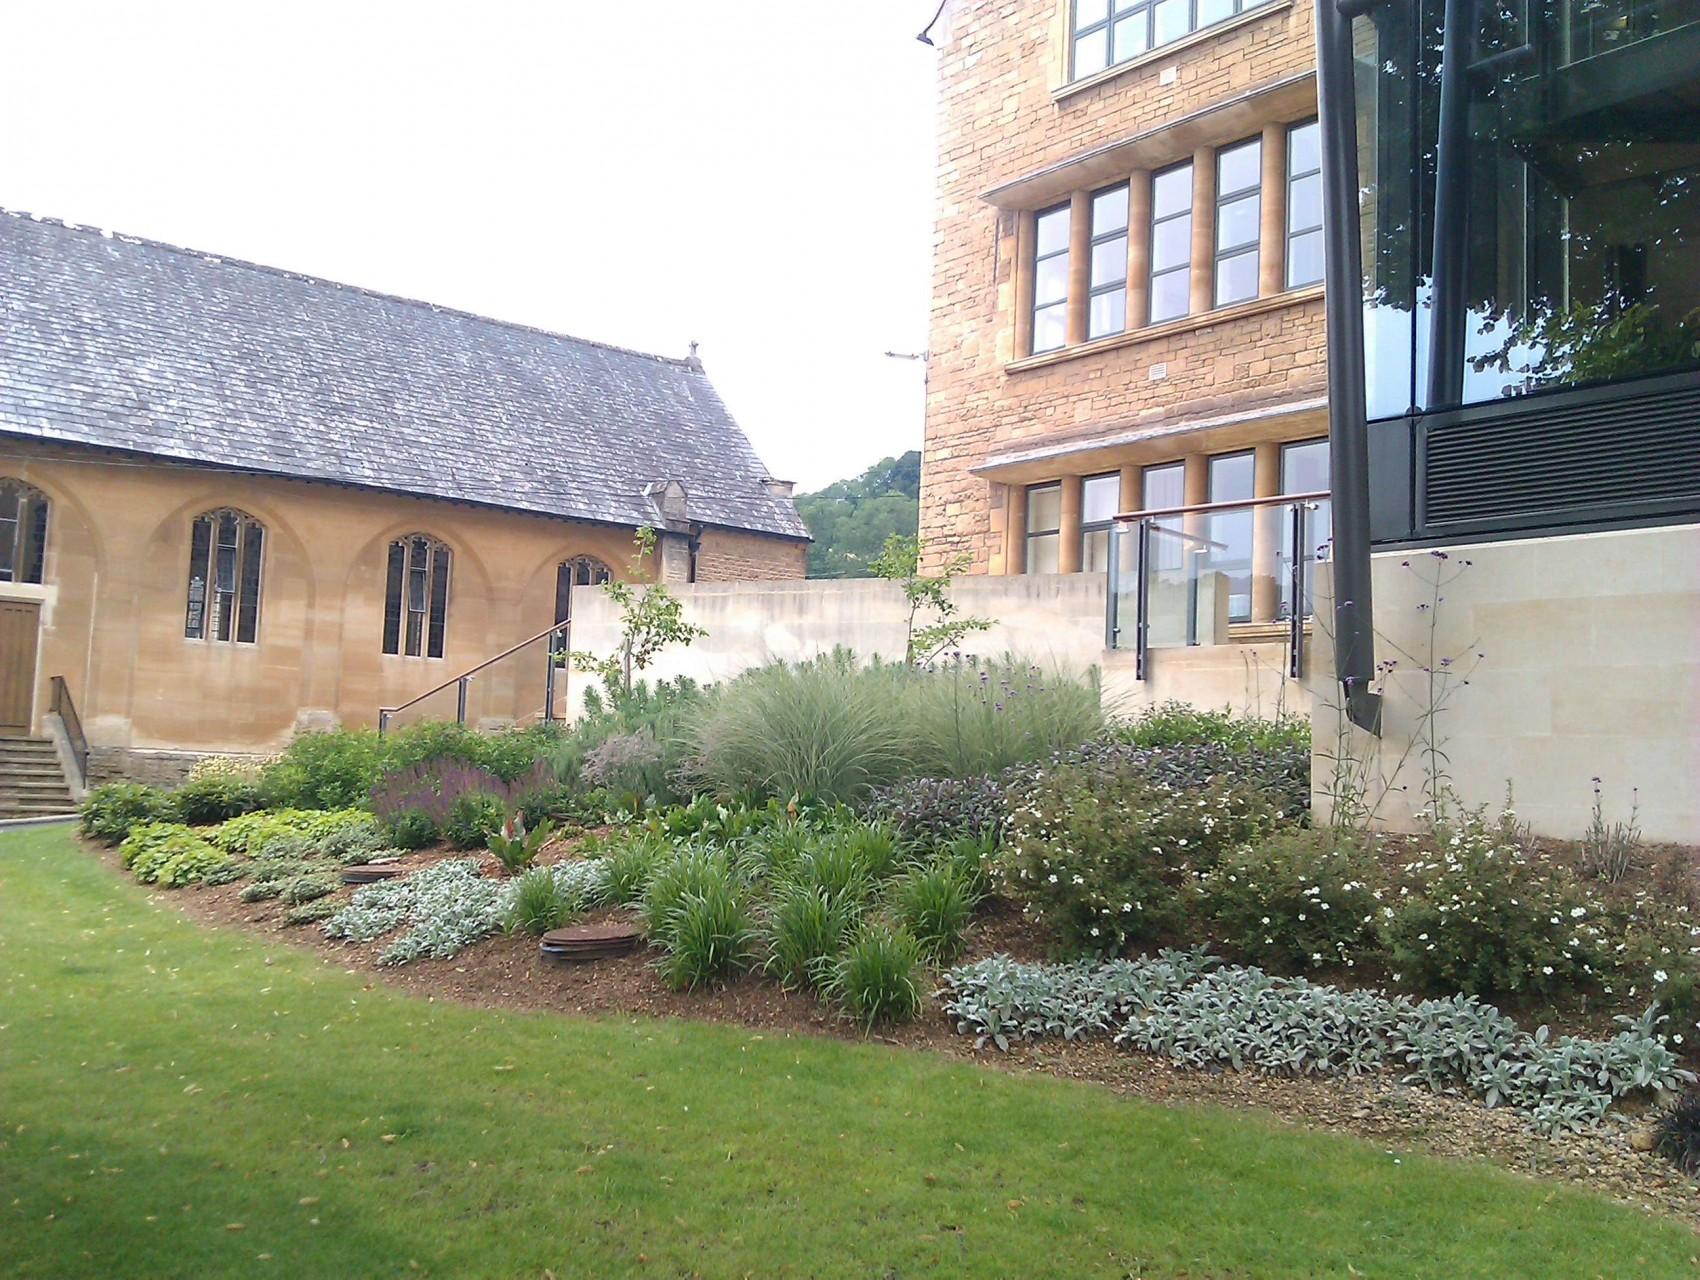 Bath School Garden Design01